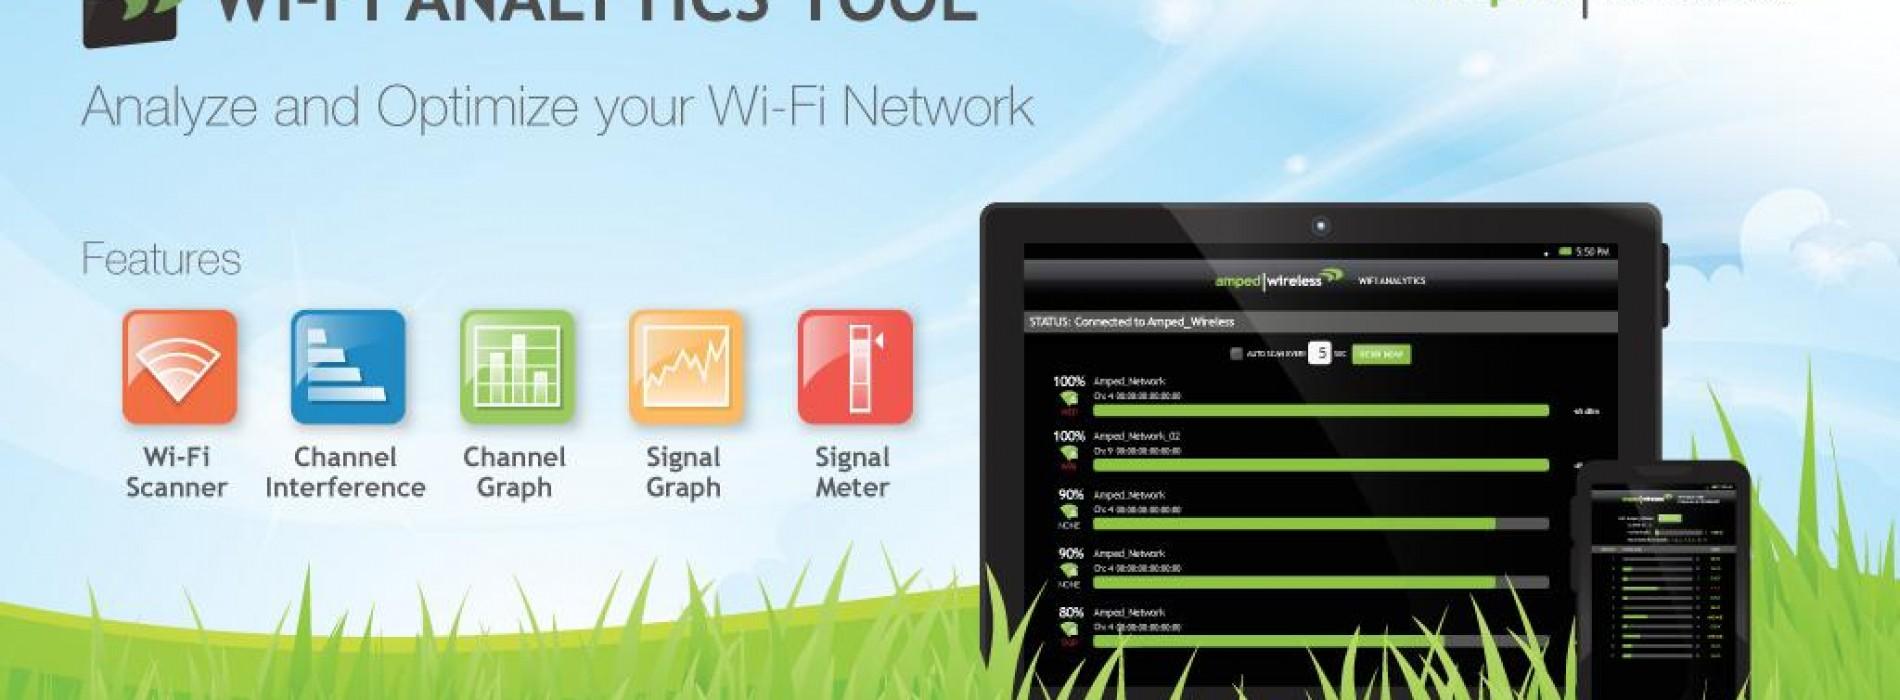 Amped Wireless Announces Wi-Fi Analytics App